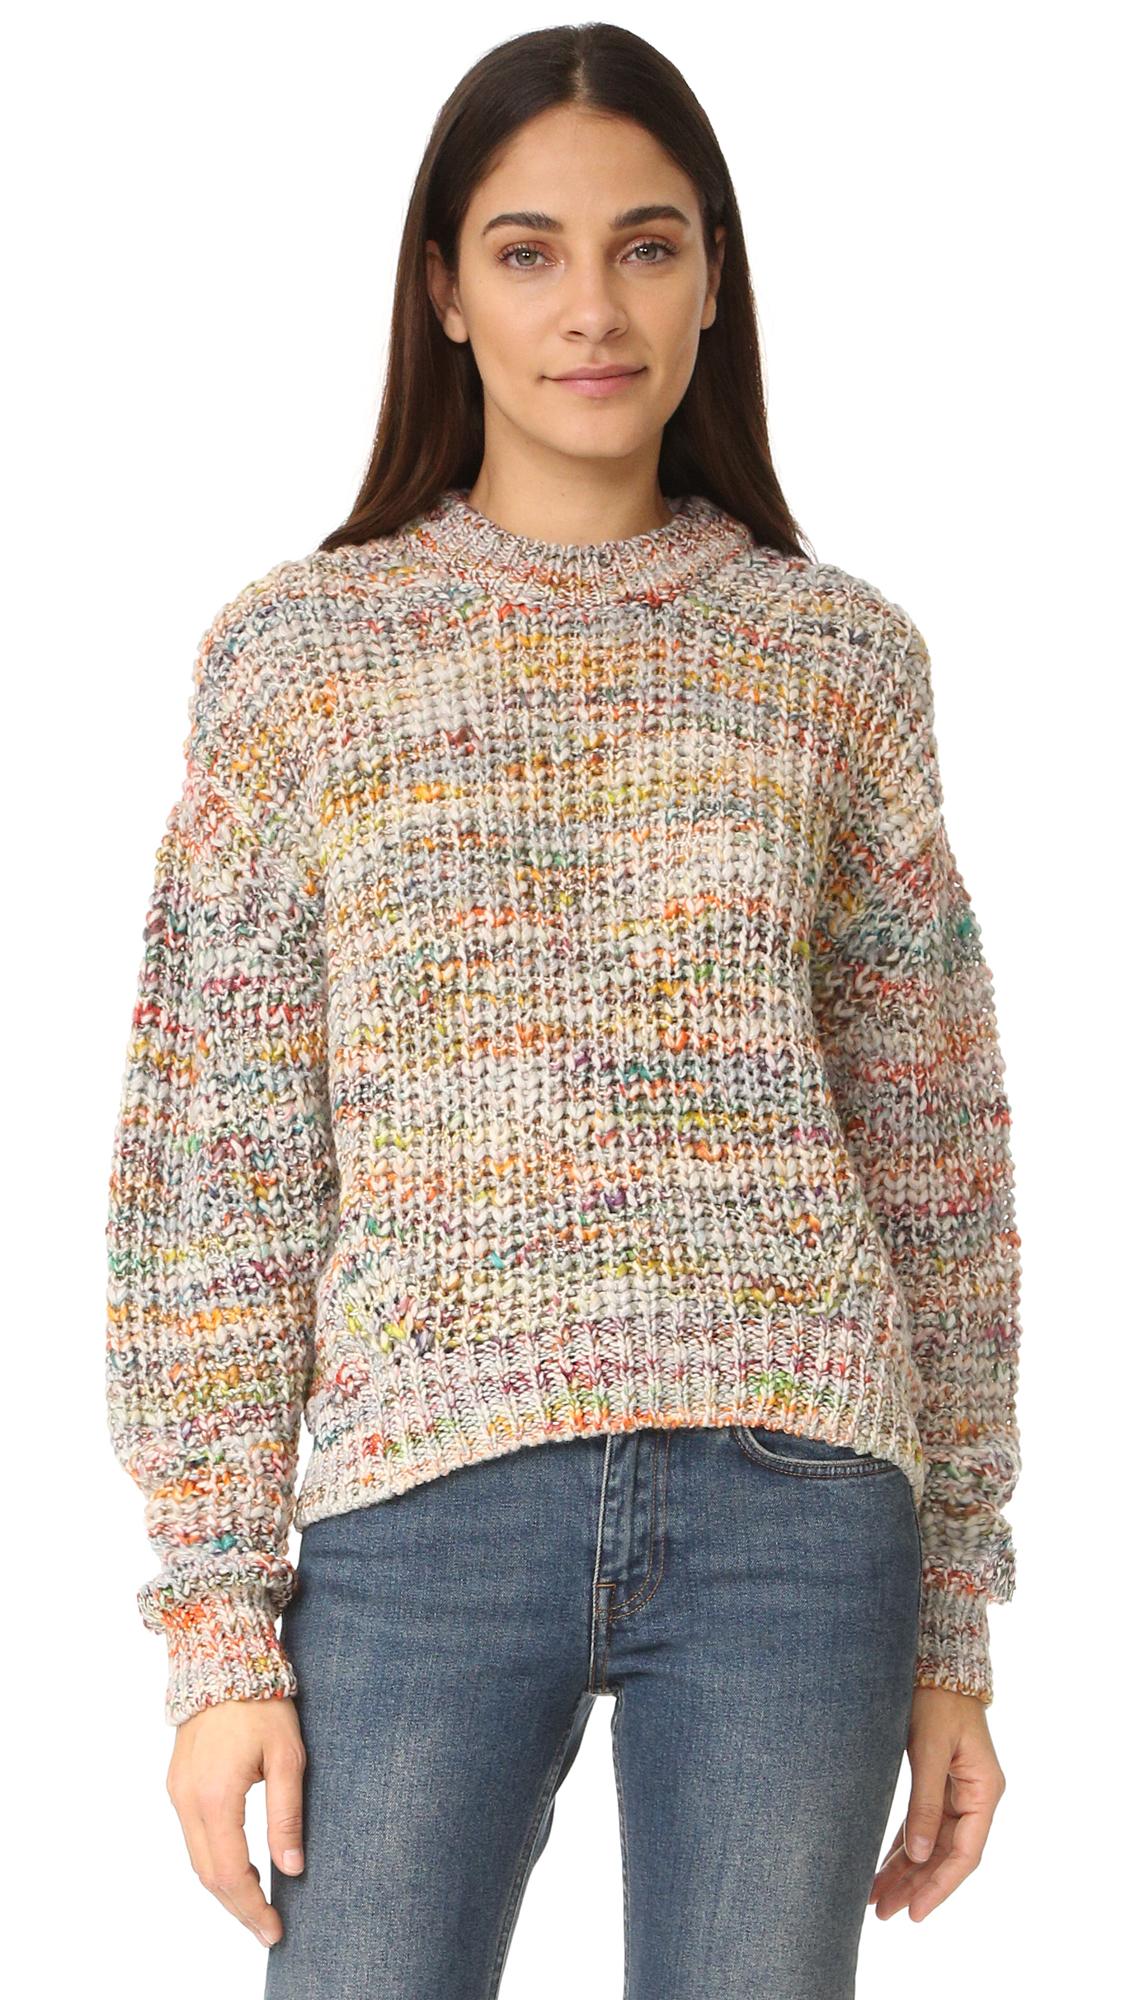 Acne Studios Zora Multi Sweater - White Mix at Shopbop